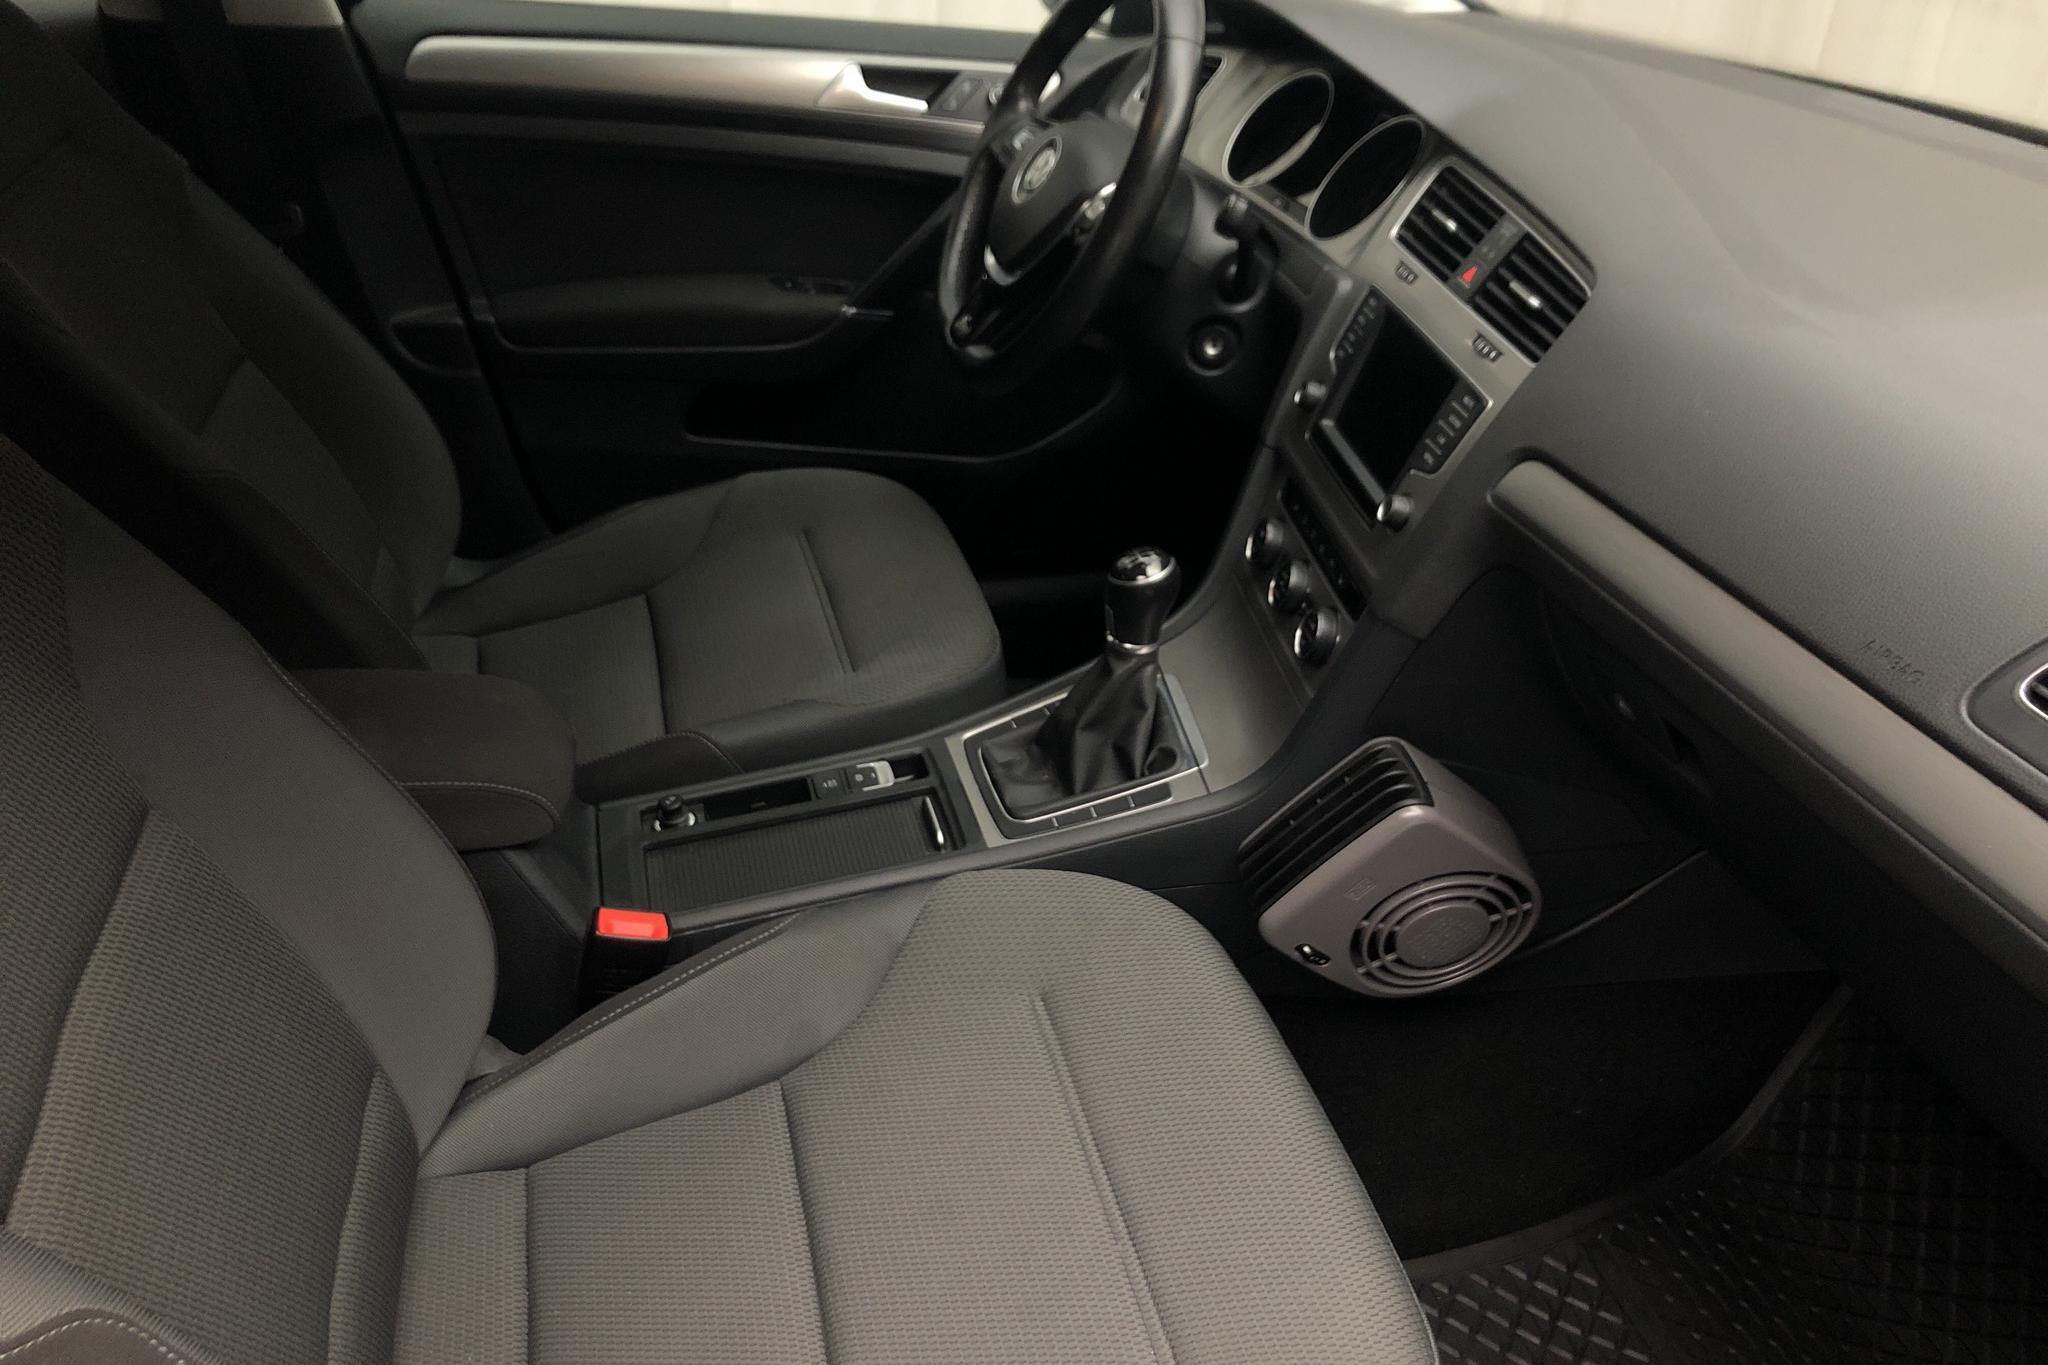 VW Golf VII 1.2 TSI 5dr (110hk) - 55 280 km - Manual - black - 2016